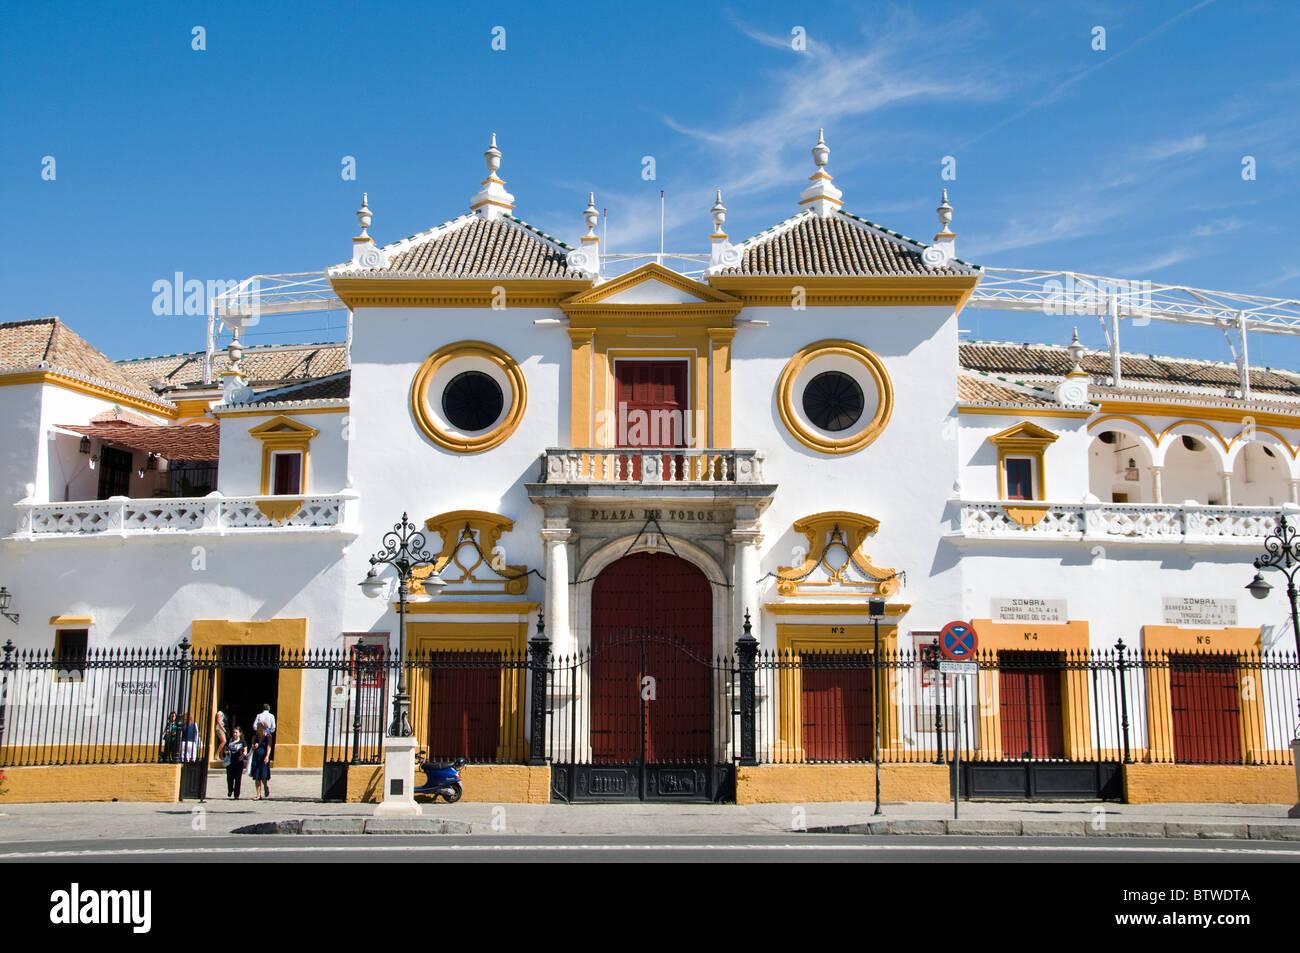 The Plaza de Toros de la Real Maestranza de Caballería de Sevilla is the oldest bullring in Spain  Andalusia - Stock Image